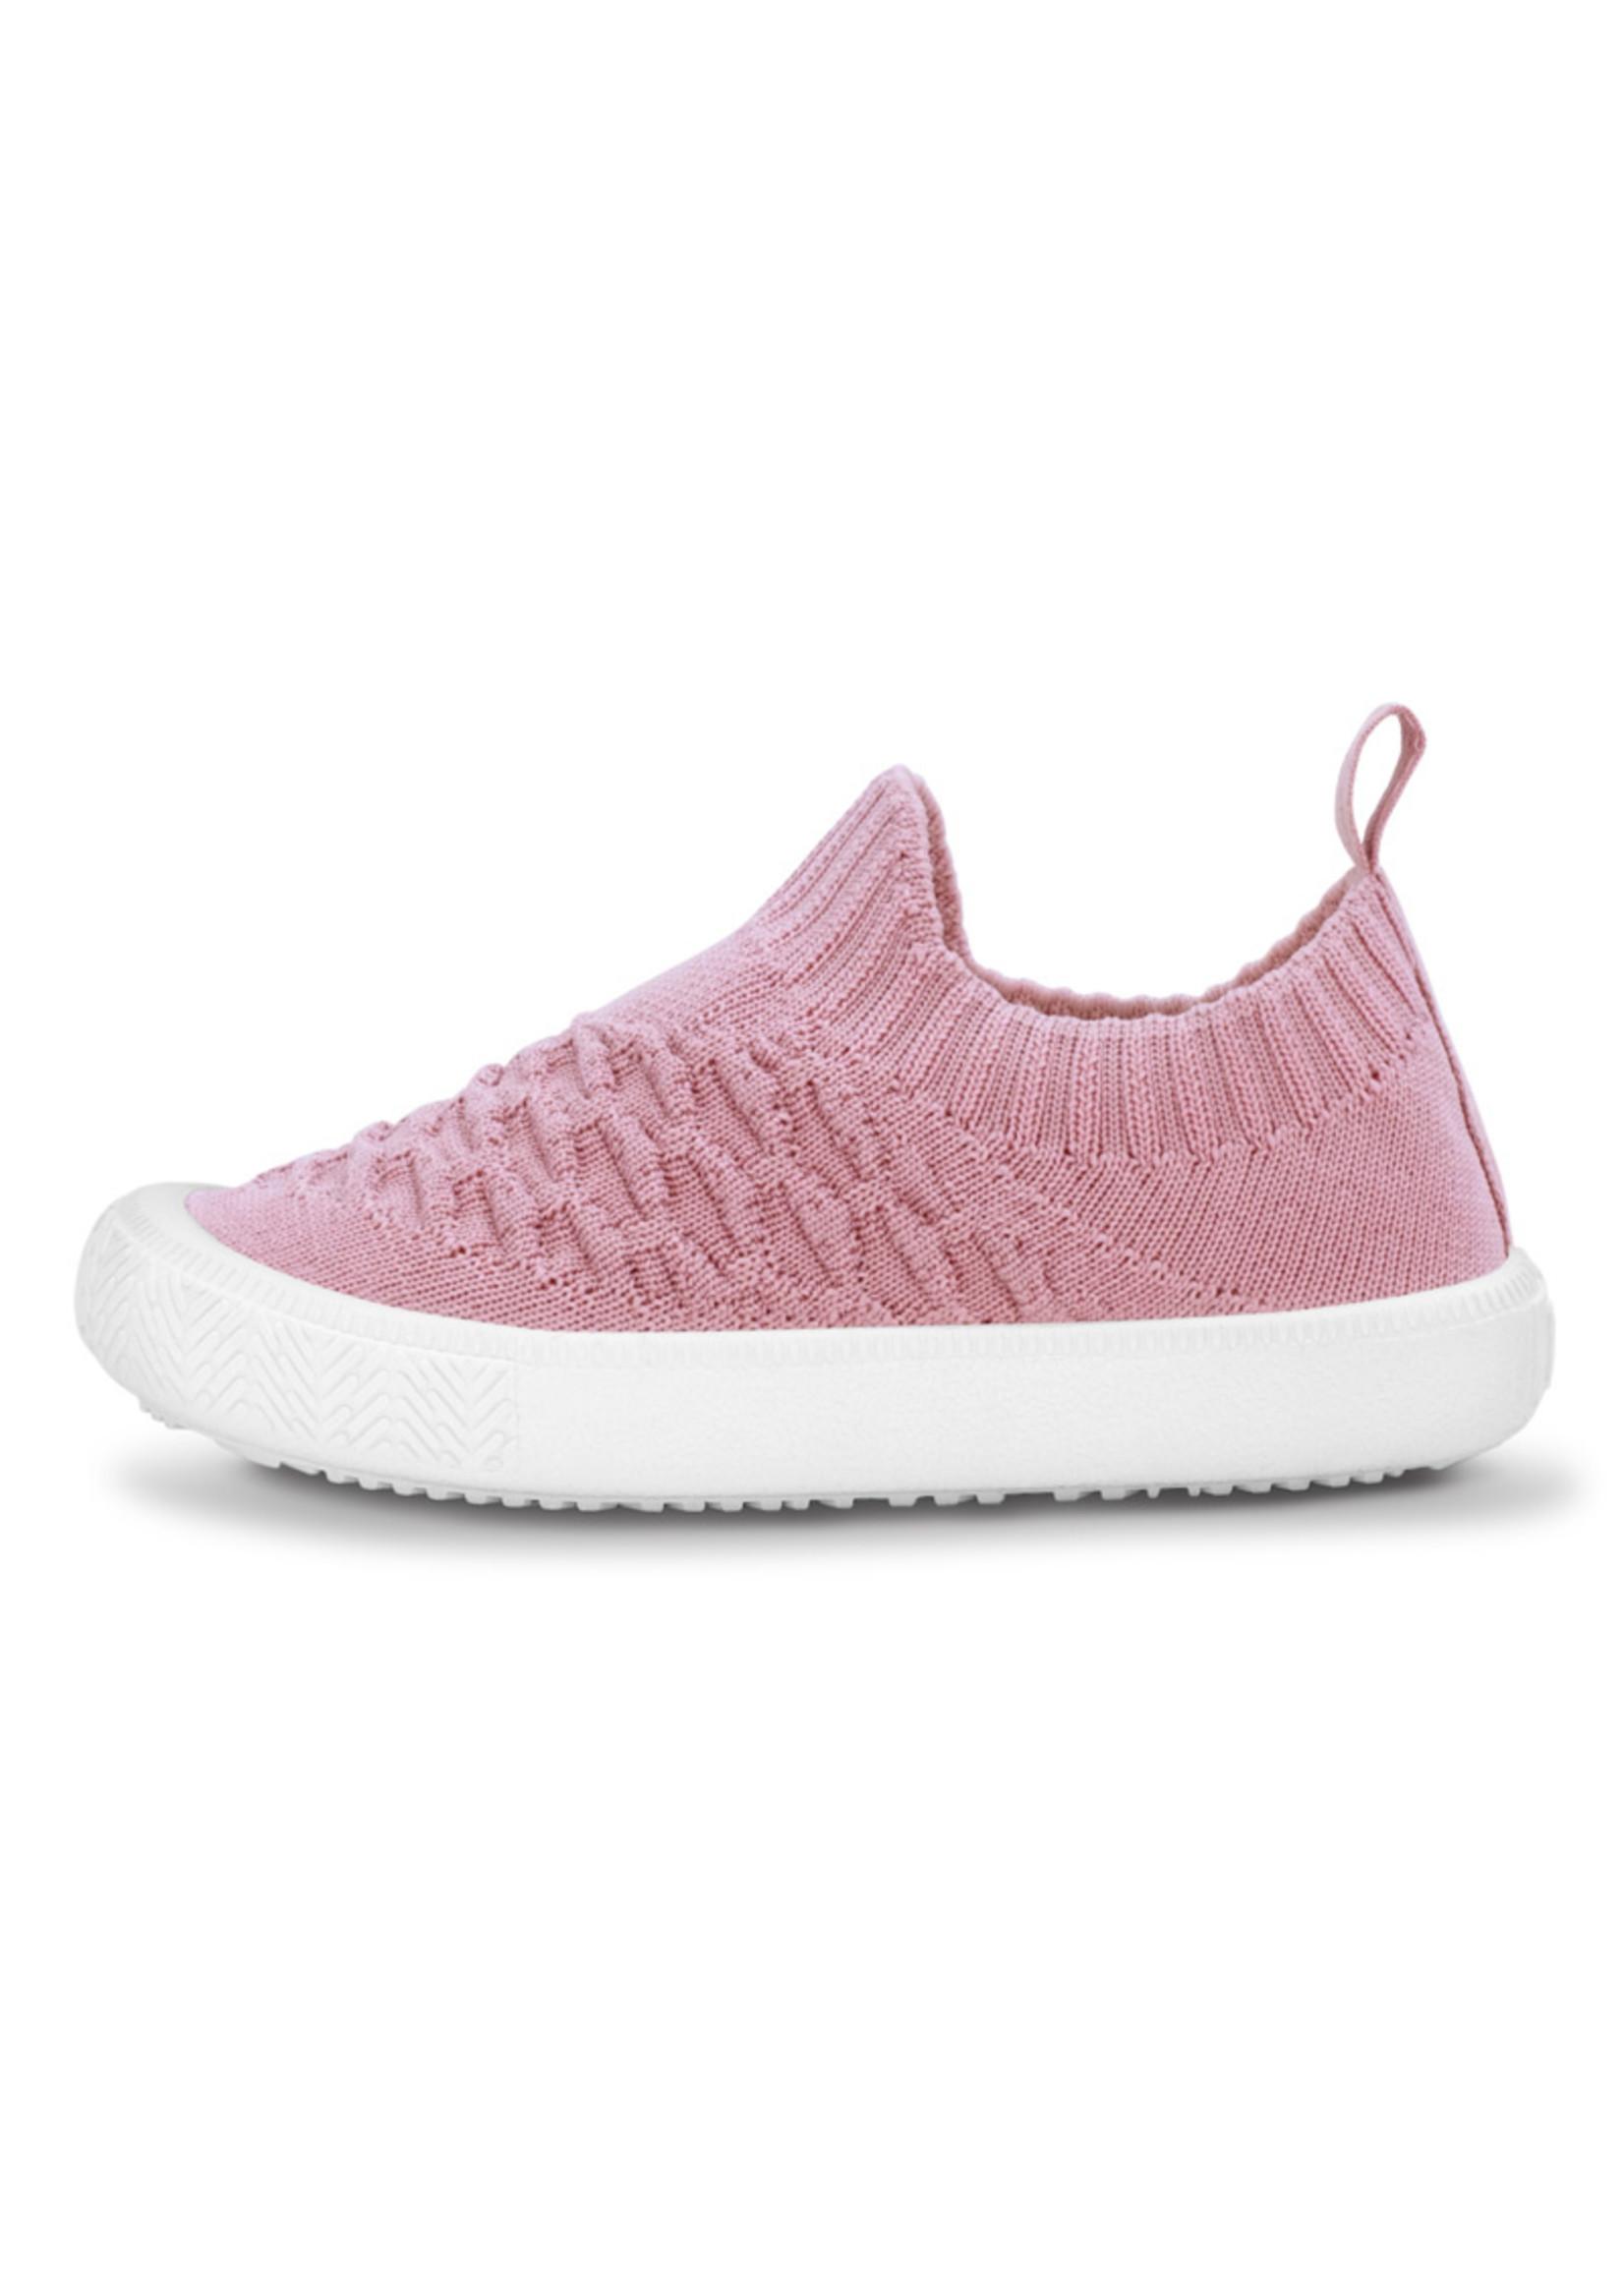 Jan & Jul Chaussure en tricot Xplorer -Pale Pink